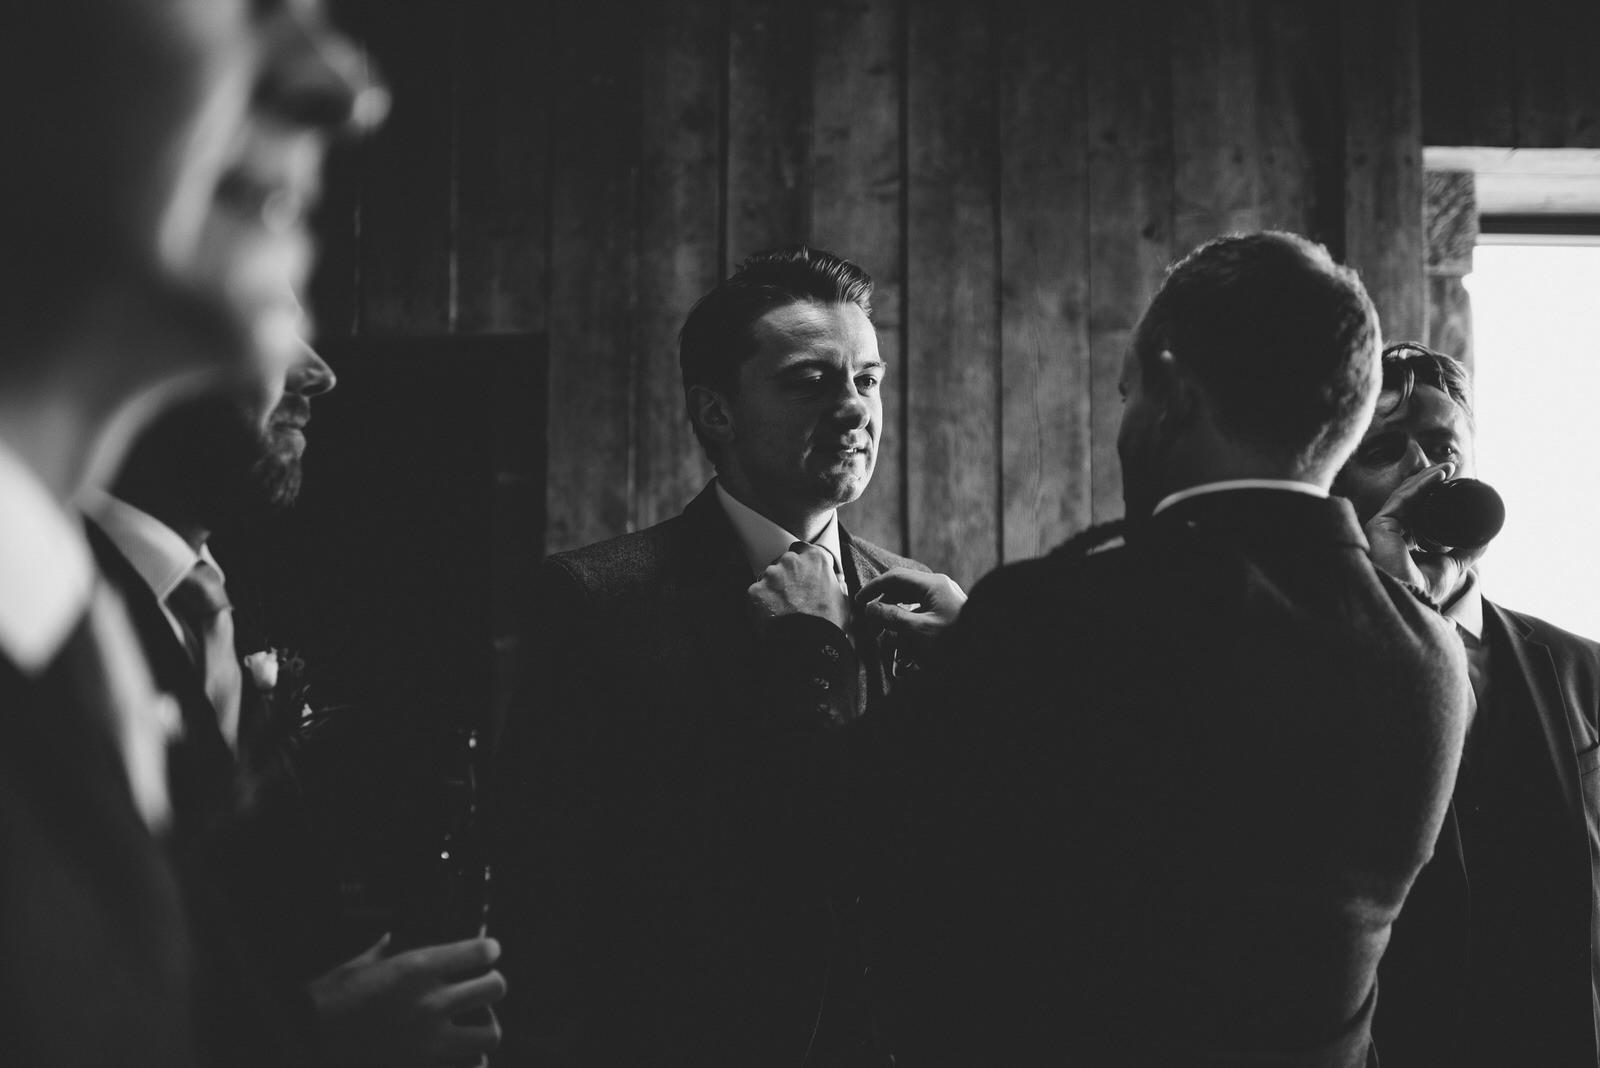 014-GUARDSWELL-FARM-WEDDING-ALTERNATIVE-SCOTTISH-WEDDING-PHOTOGRAPHER-SCOTTISH-WEDDING-DESTINATION-WEDDING-PHOTOGRAPHER.JPG